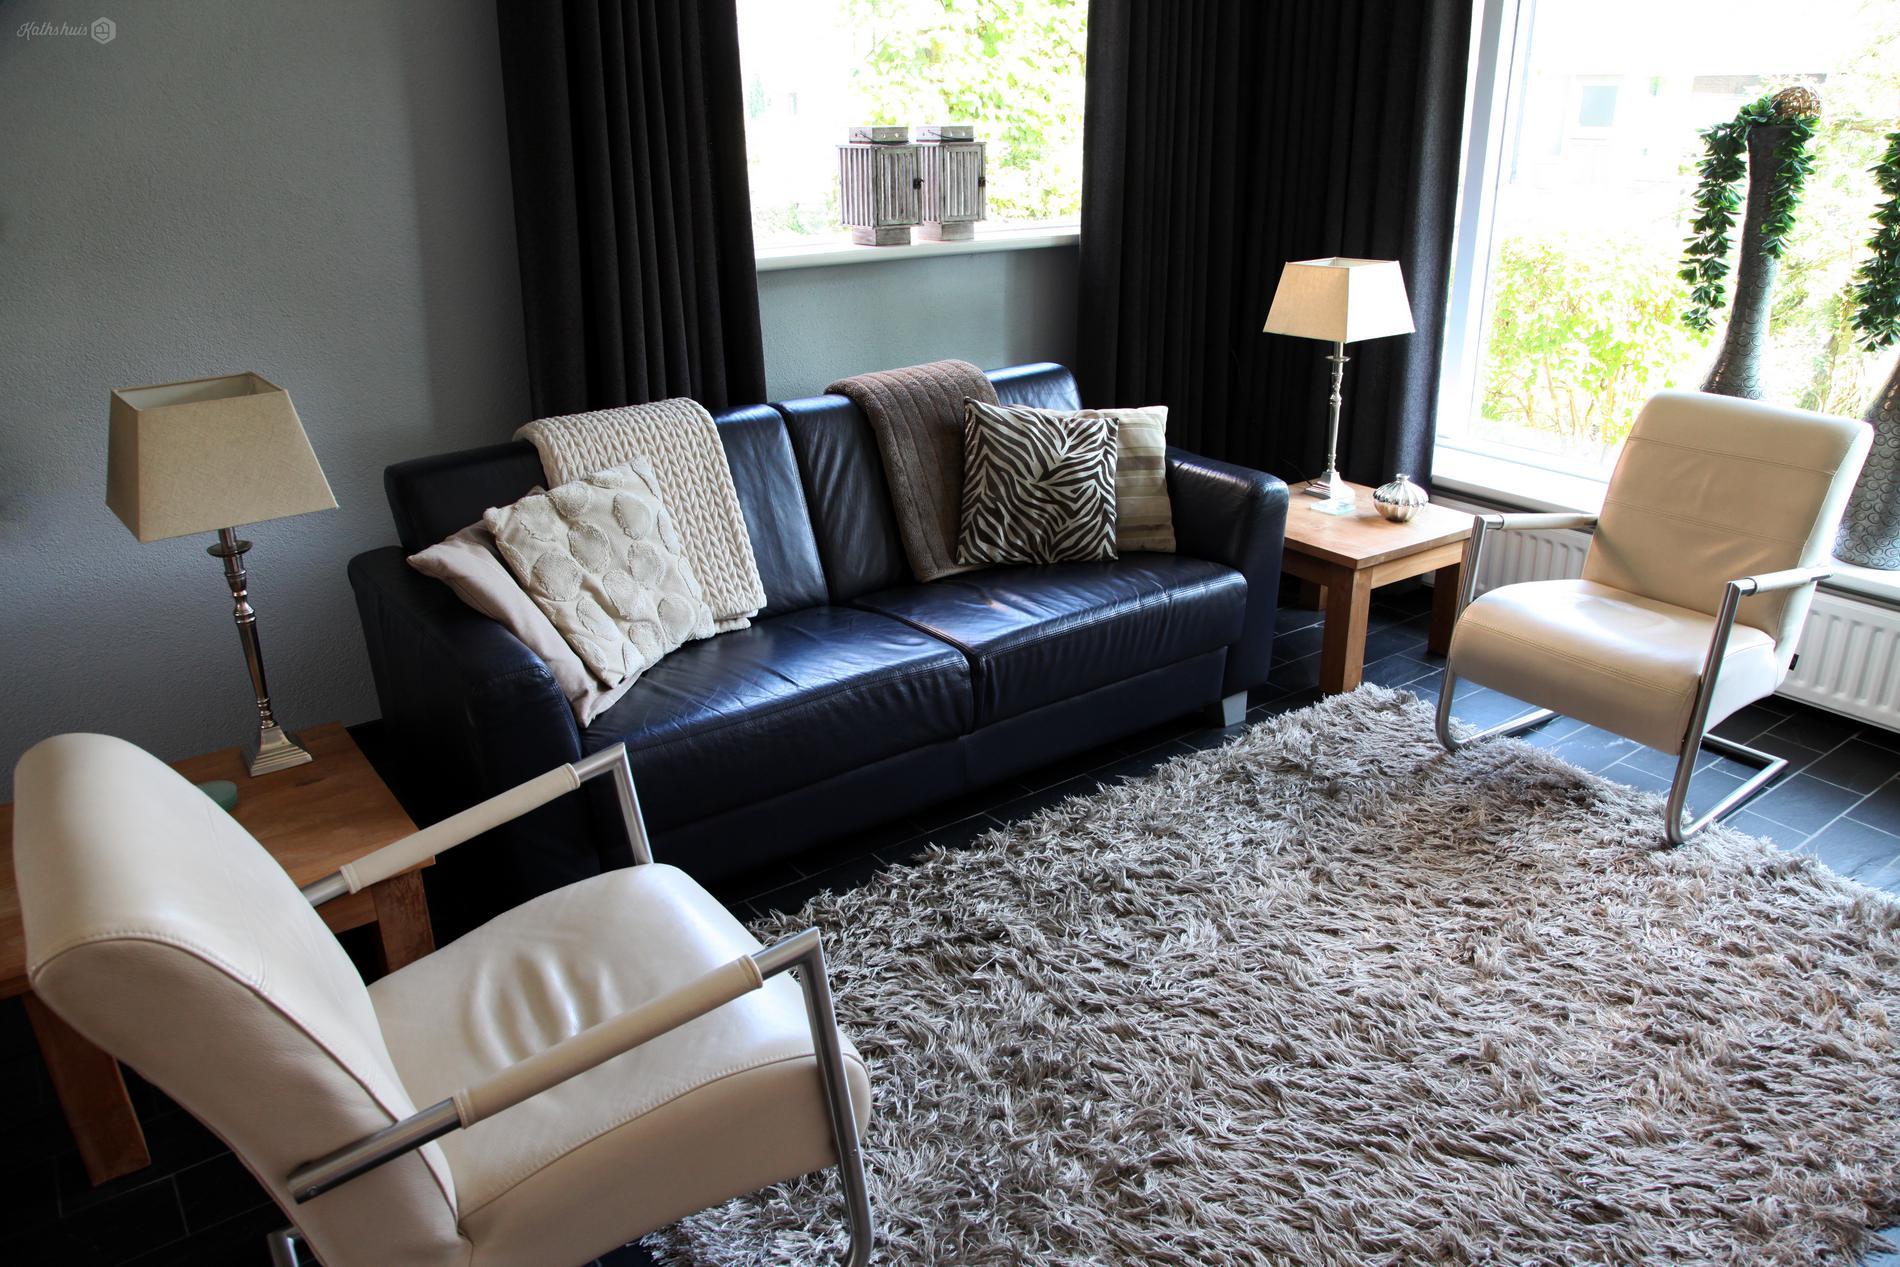 Slaapkamer muur kleur lichtblauw for Mezzanine in de woonkamer